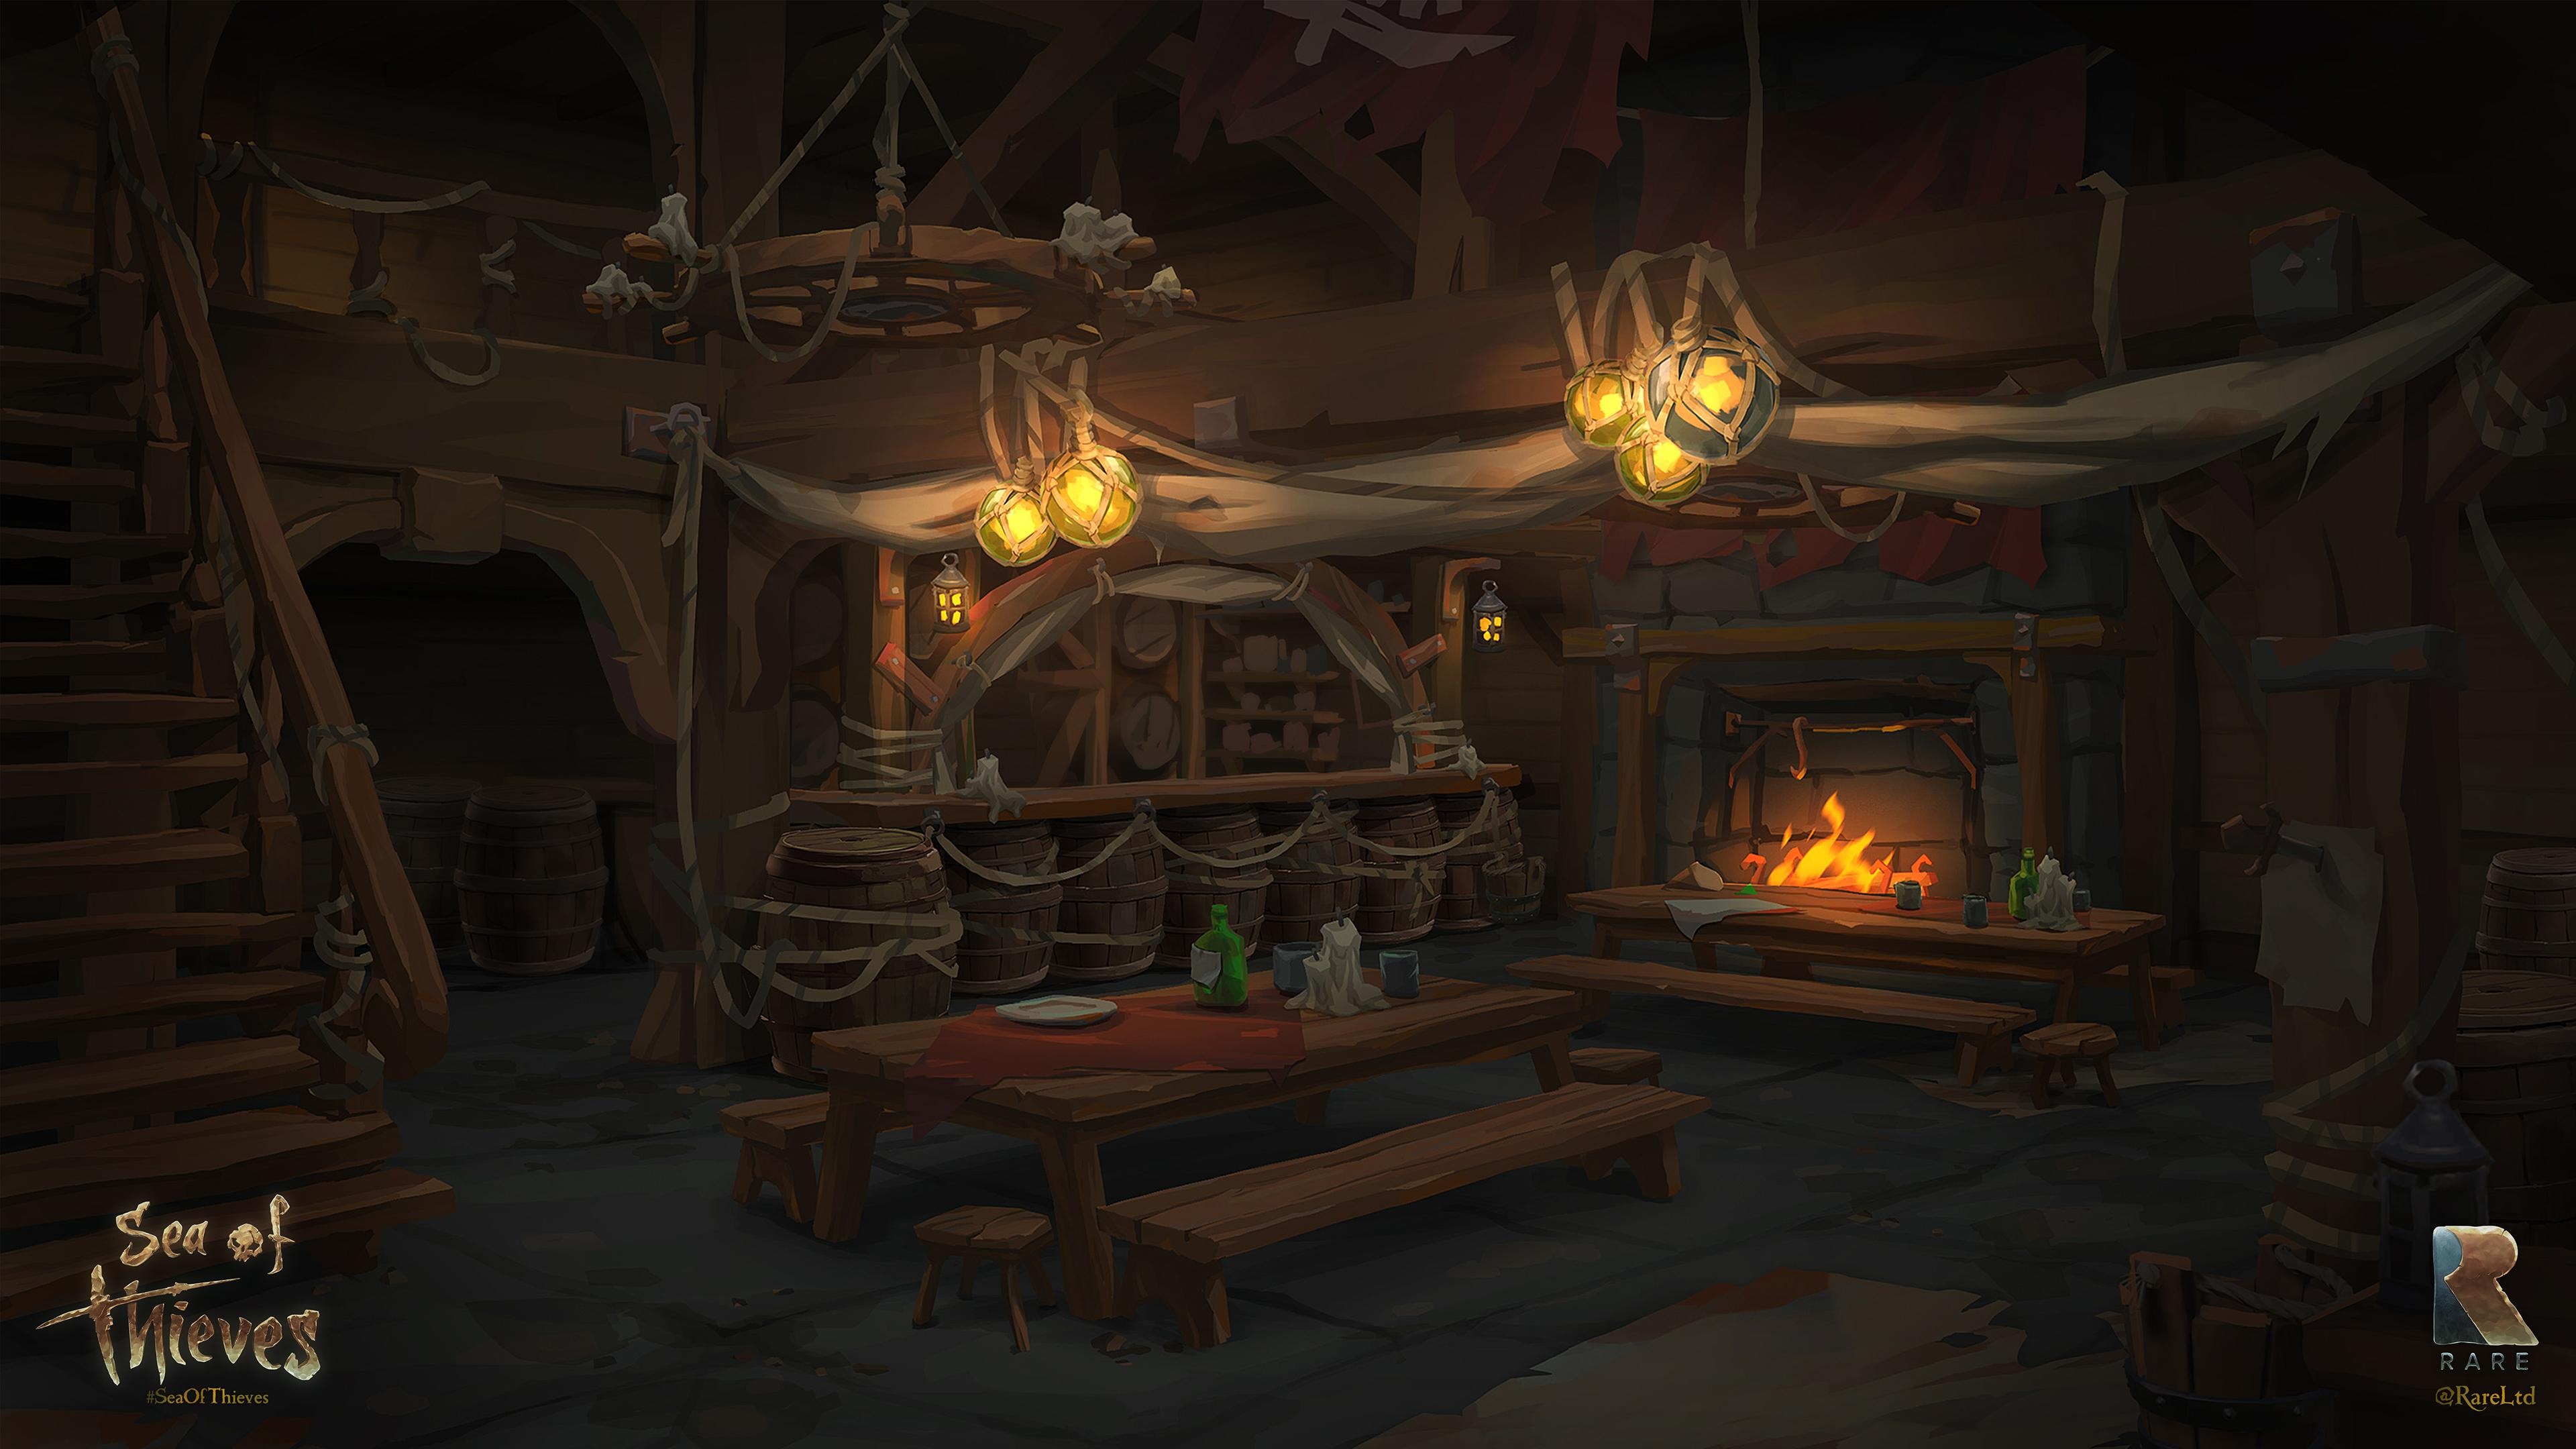 Bedroom Chandelier New Sea Of Thieves Art Tavern